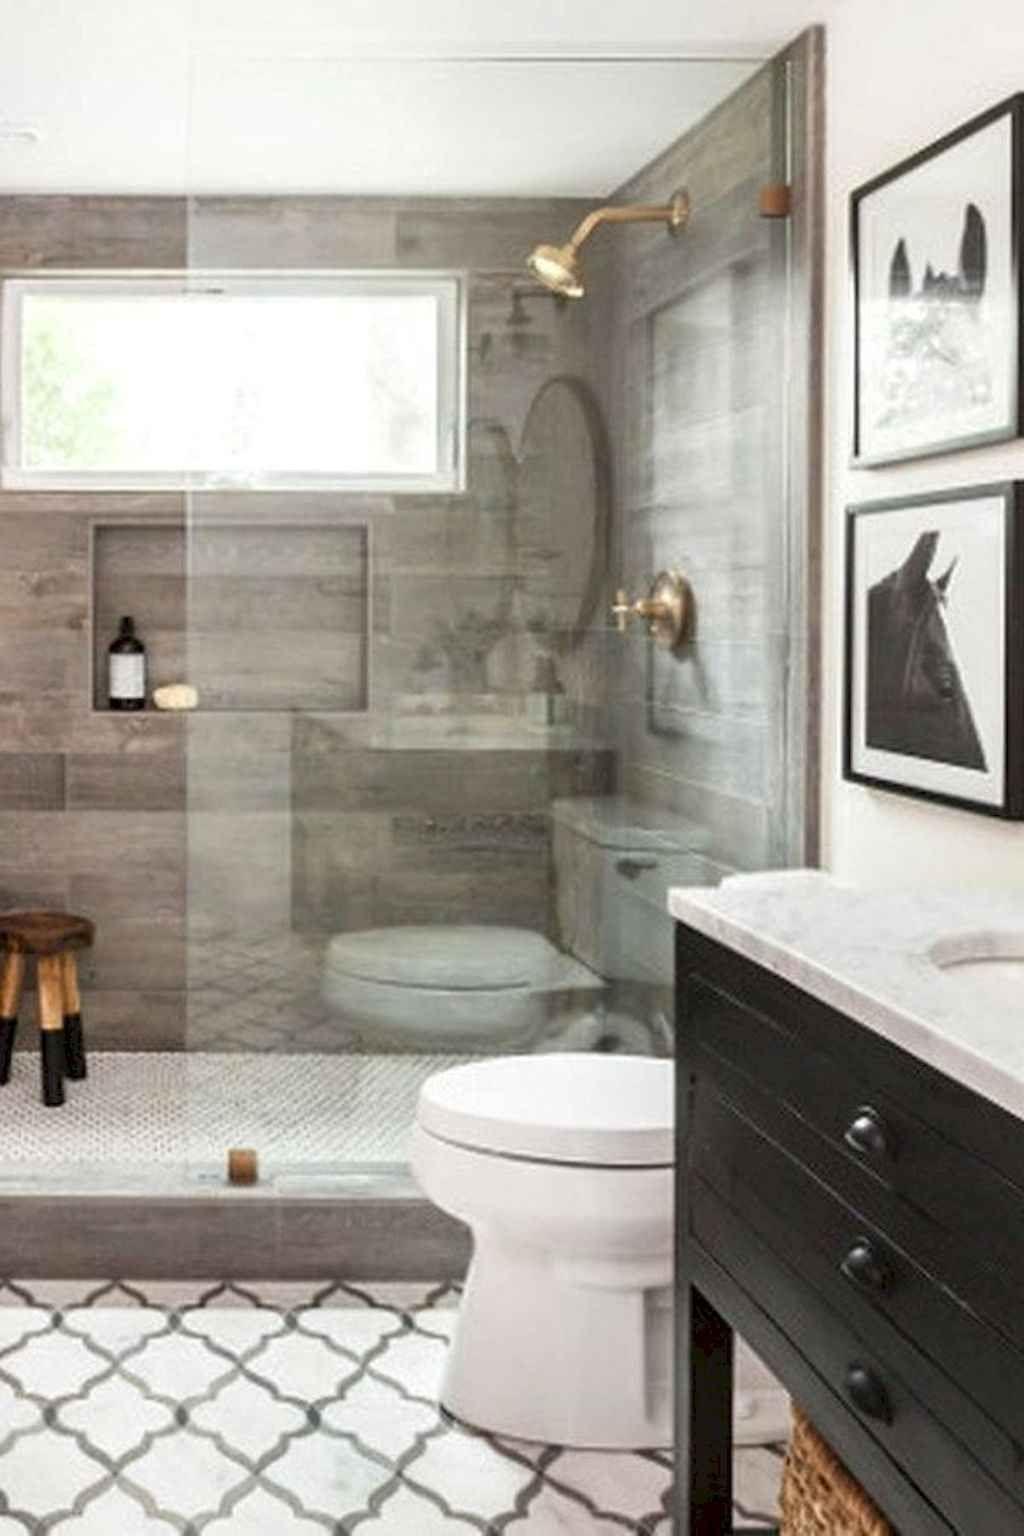 Pin By Bldr On Badezimmer Farm Style Bathrooms Restroom Remodel Bathroom Remodel Master